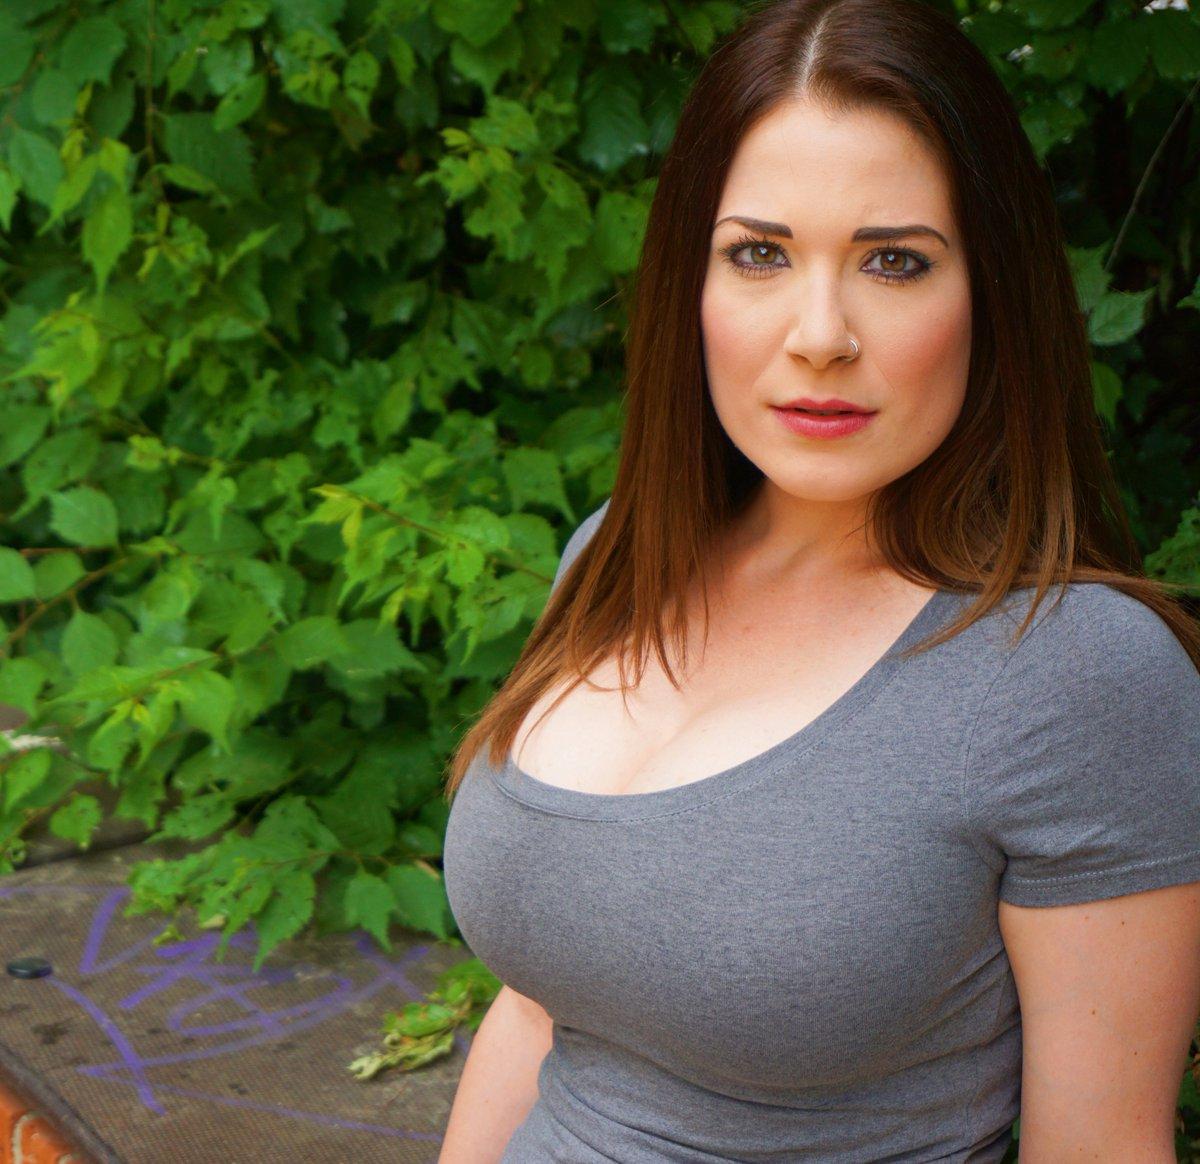 Vanessa huge polish breasts gallery mybigtitsbabes